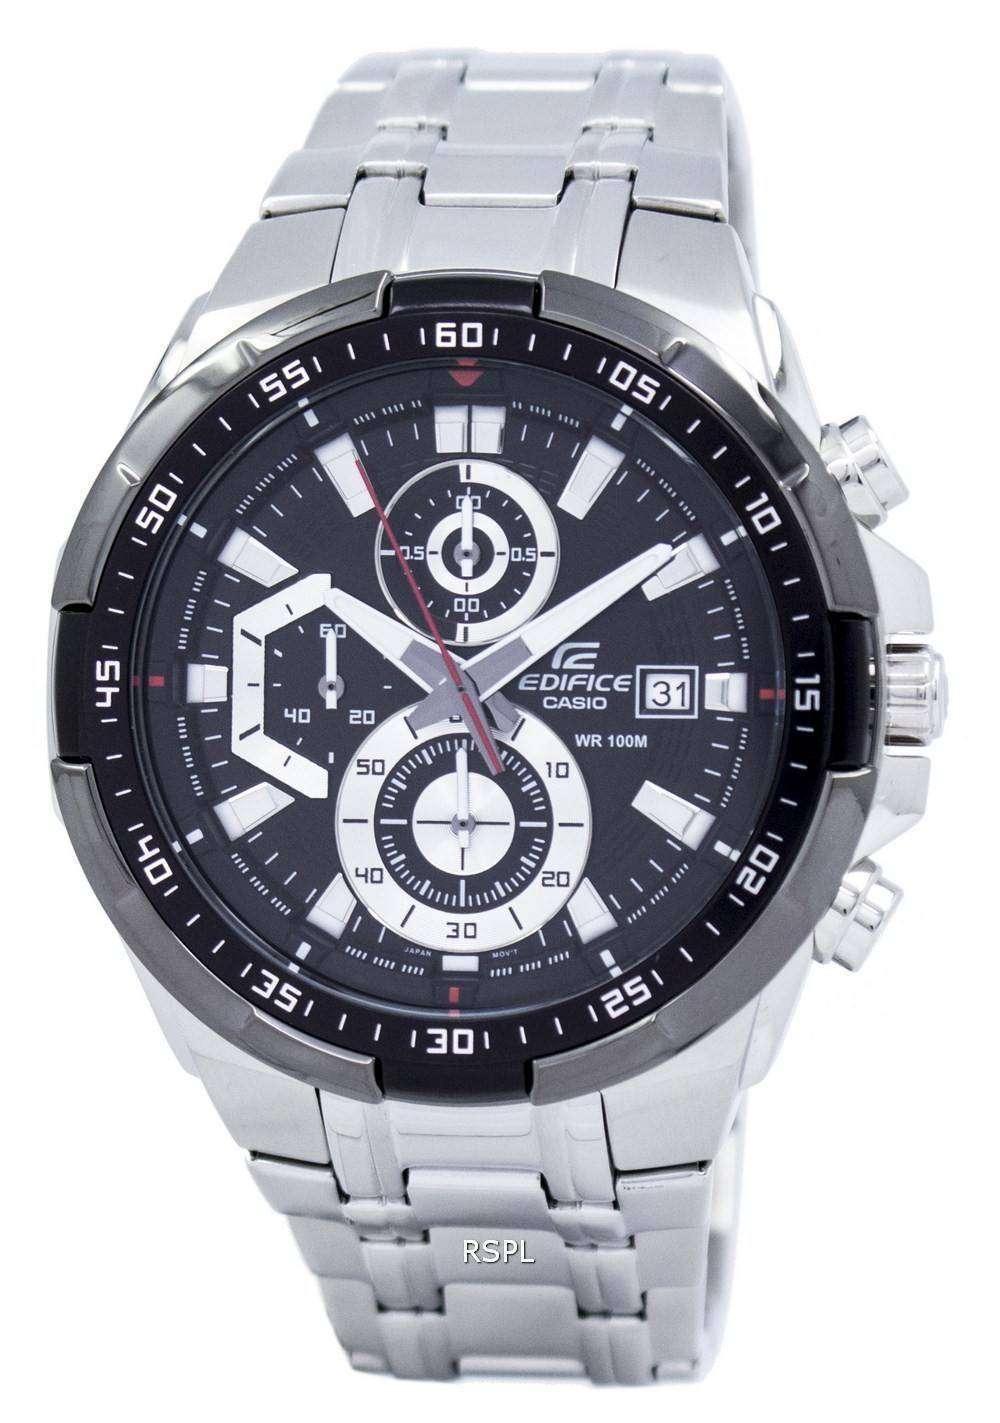 ad654d7766c0 Casio Edifice Chronograph 100M EFR-539D-1AV Mens Watch